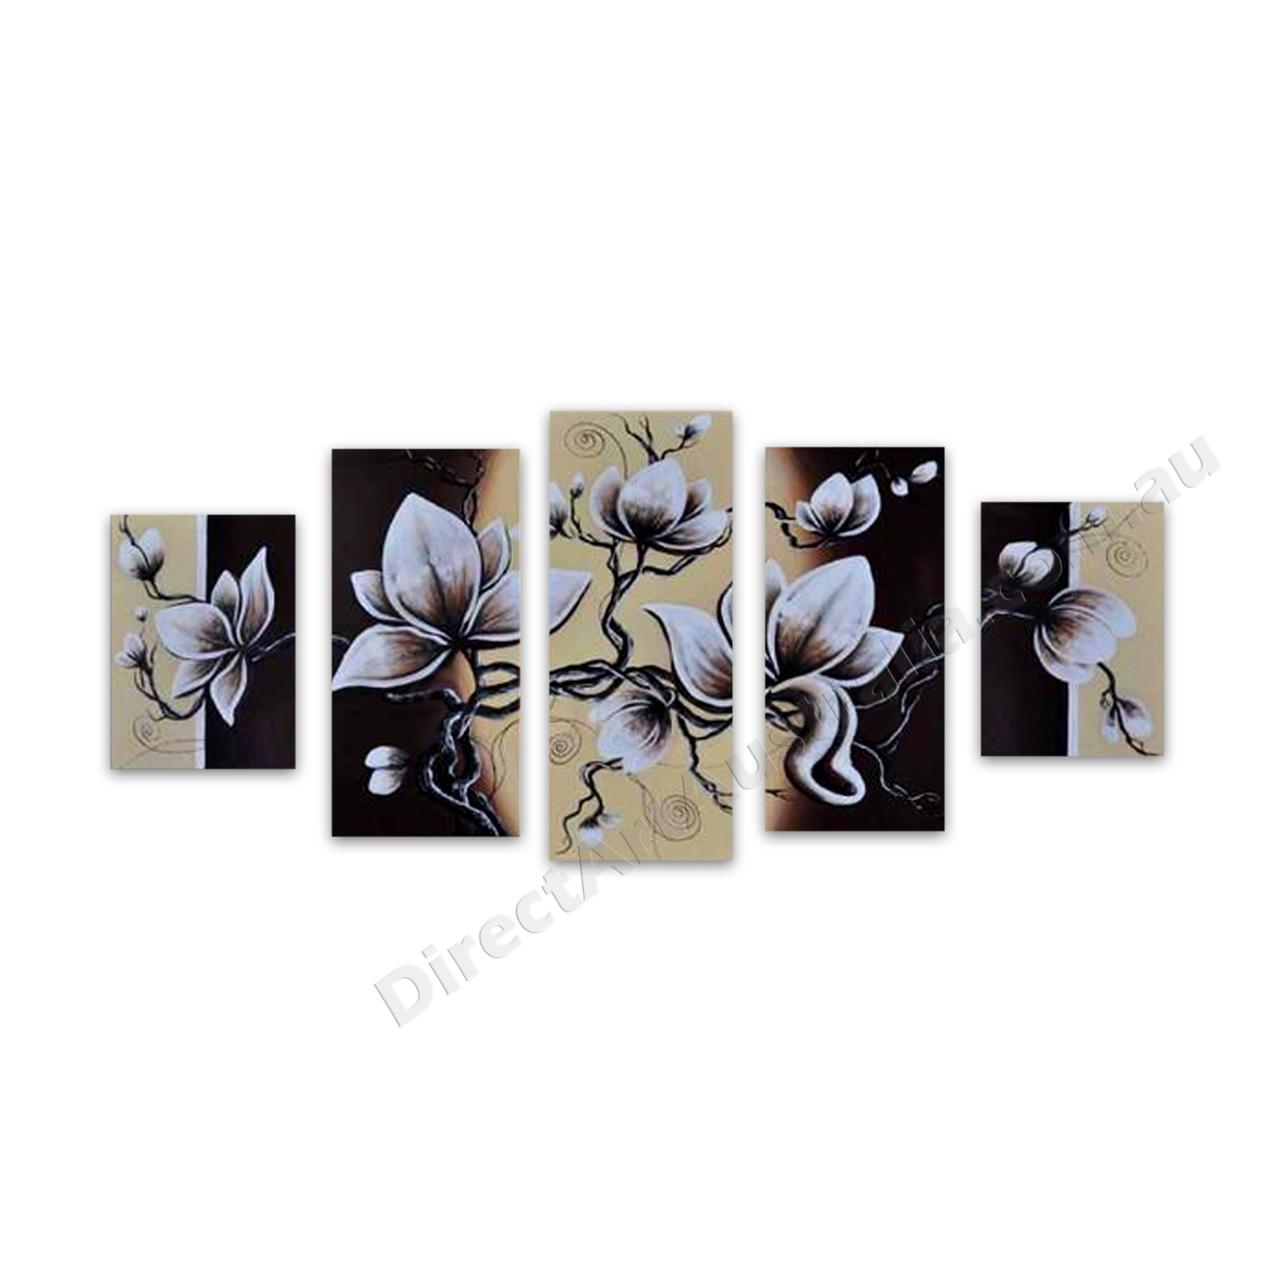 Buy White Flower Oil Painting On Canvas Online Brisbane